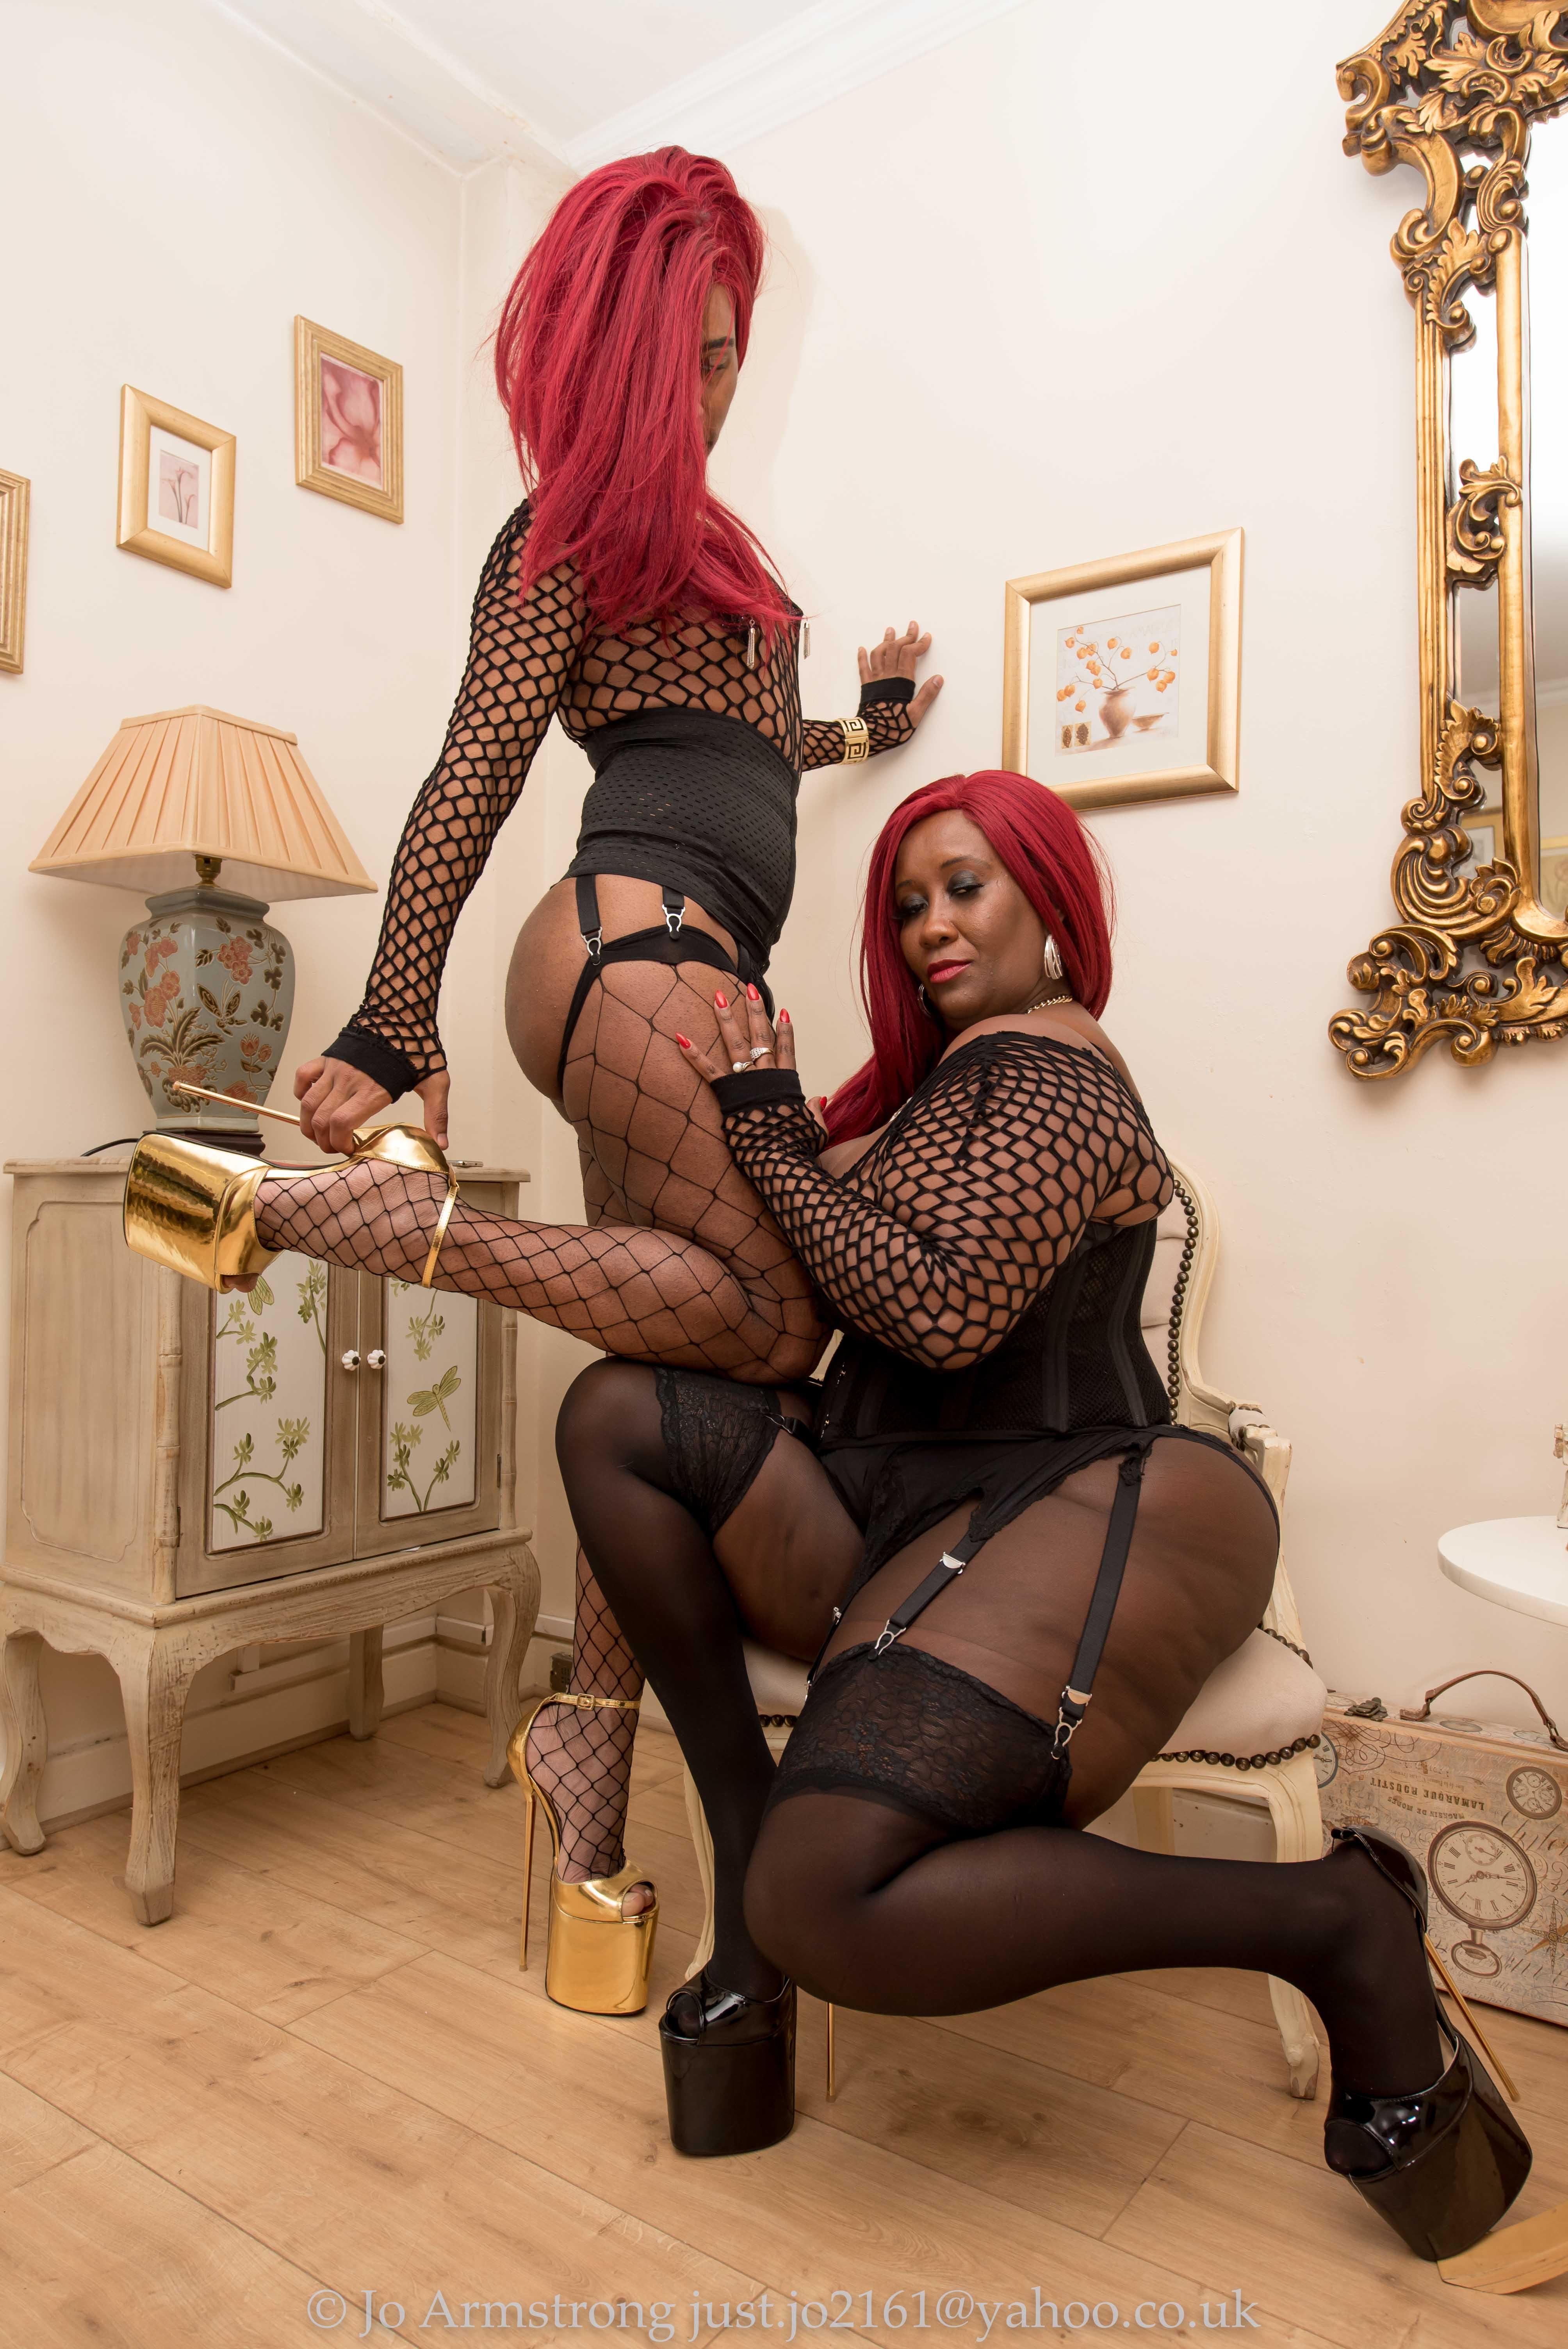 Spanking submissive men femdom